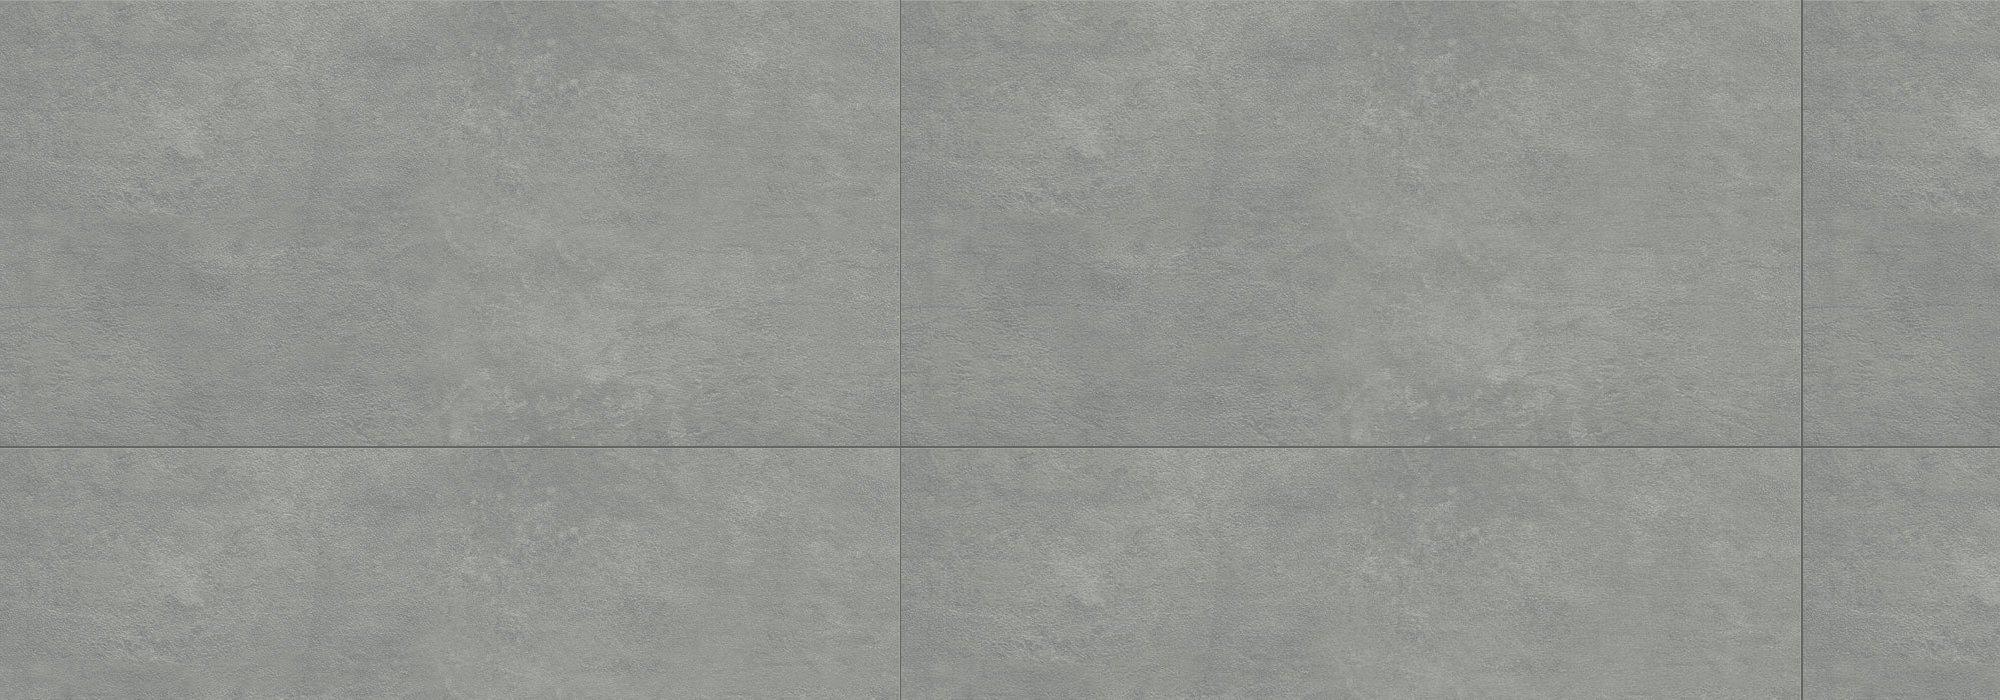 פלטות פורצלן אירון by Milstone